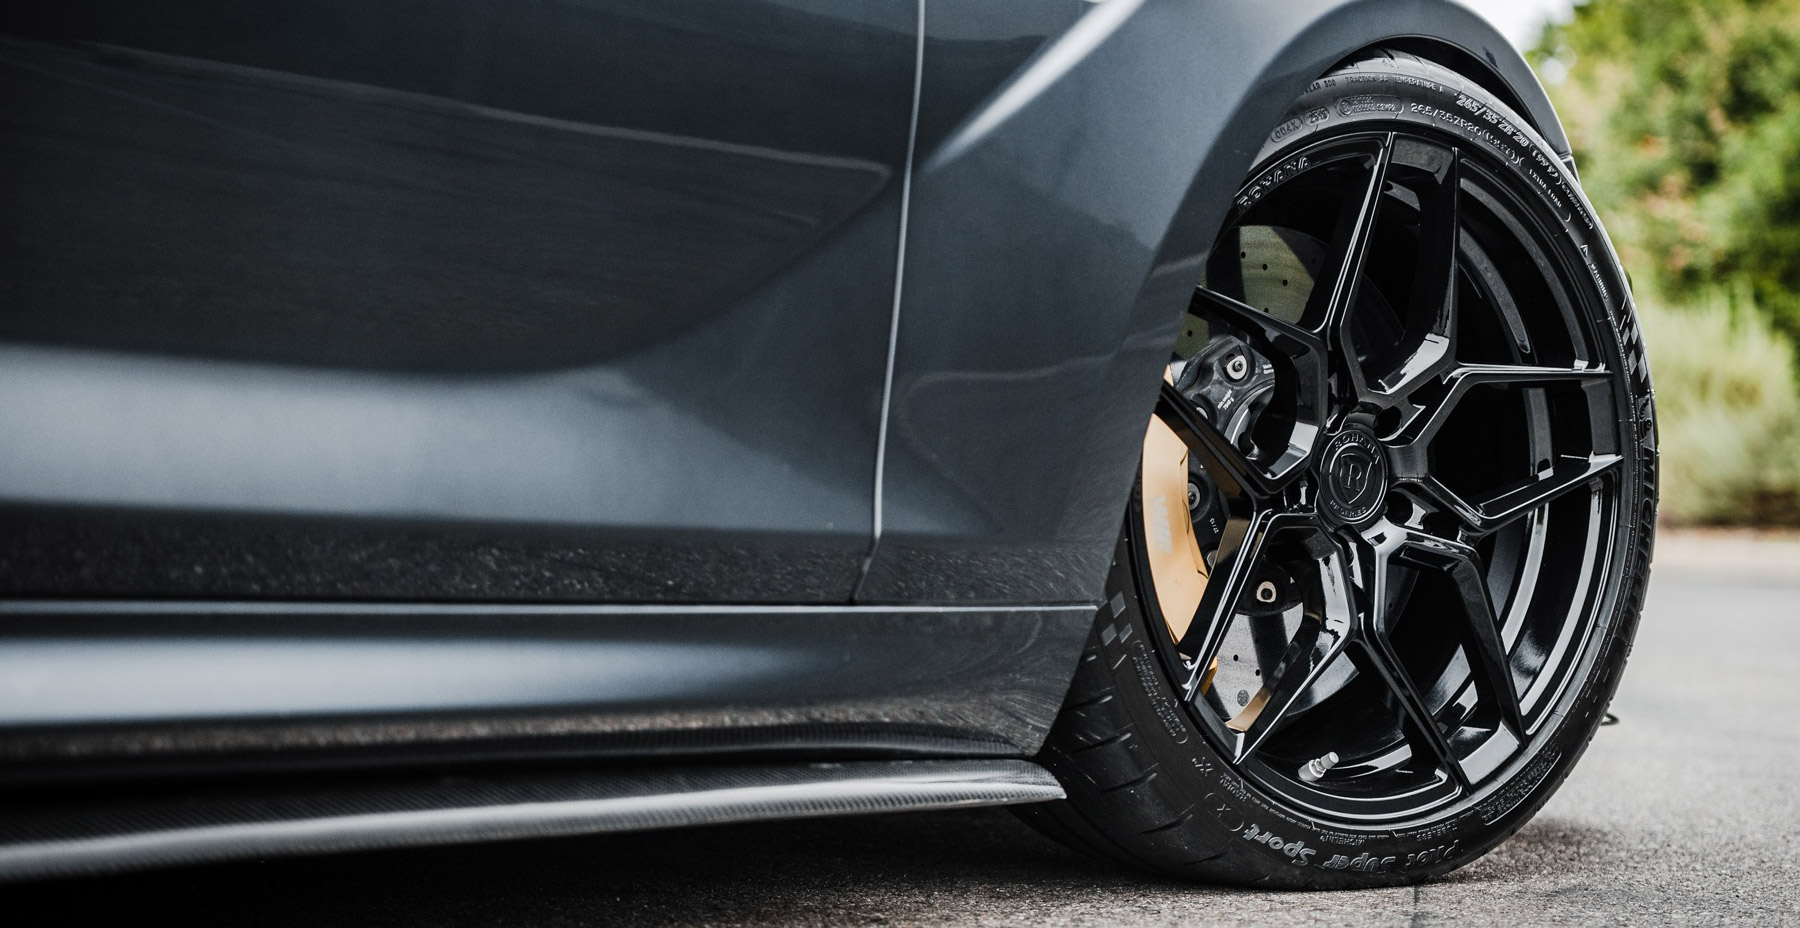 Black BMW M6 x Rohana RFX11 Wheels (Finished in Gloss Black)